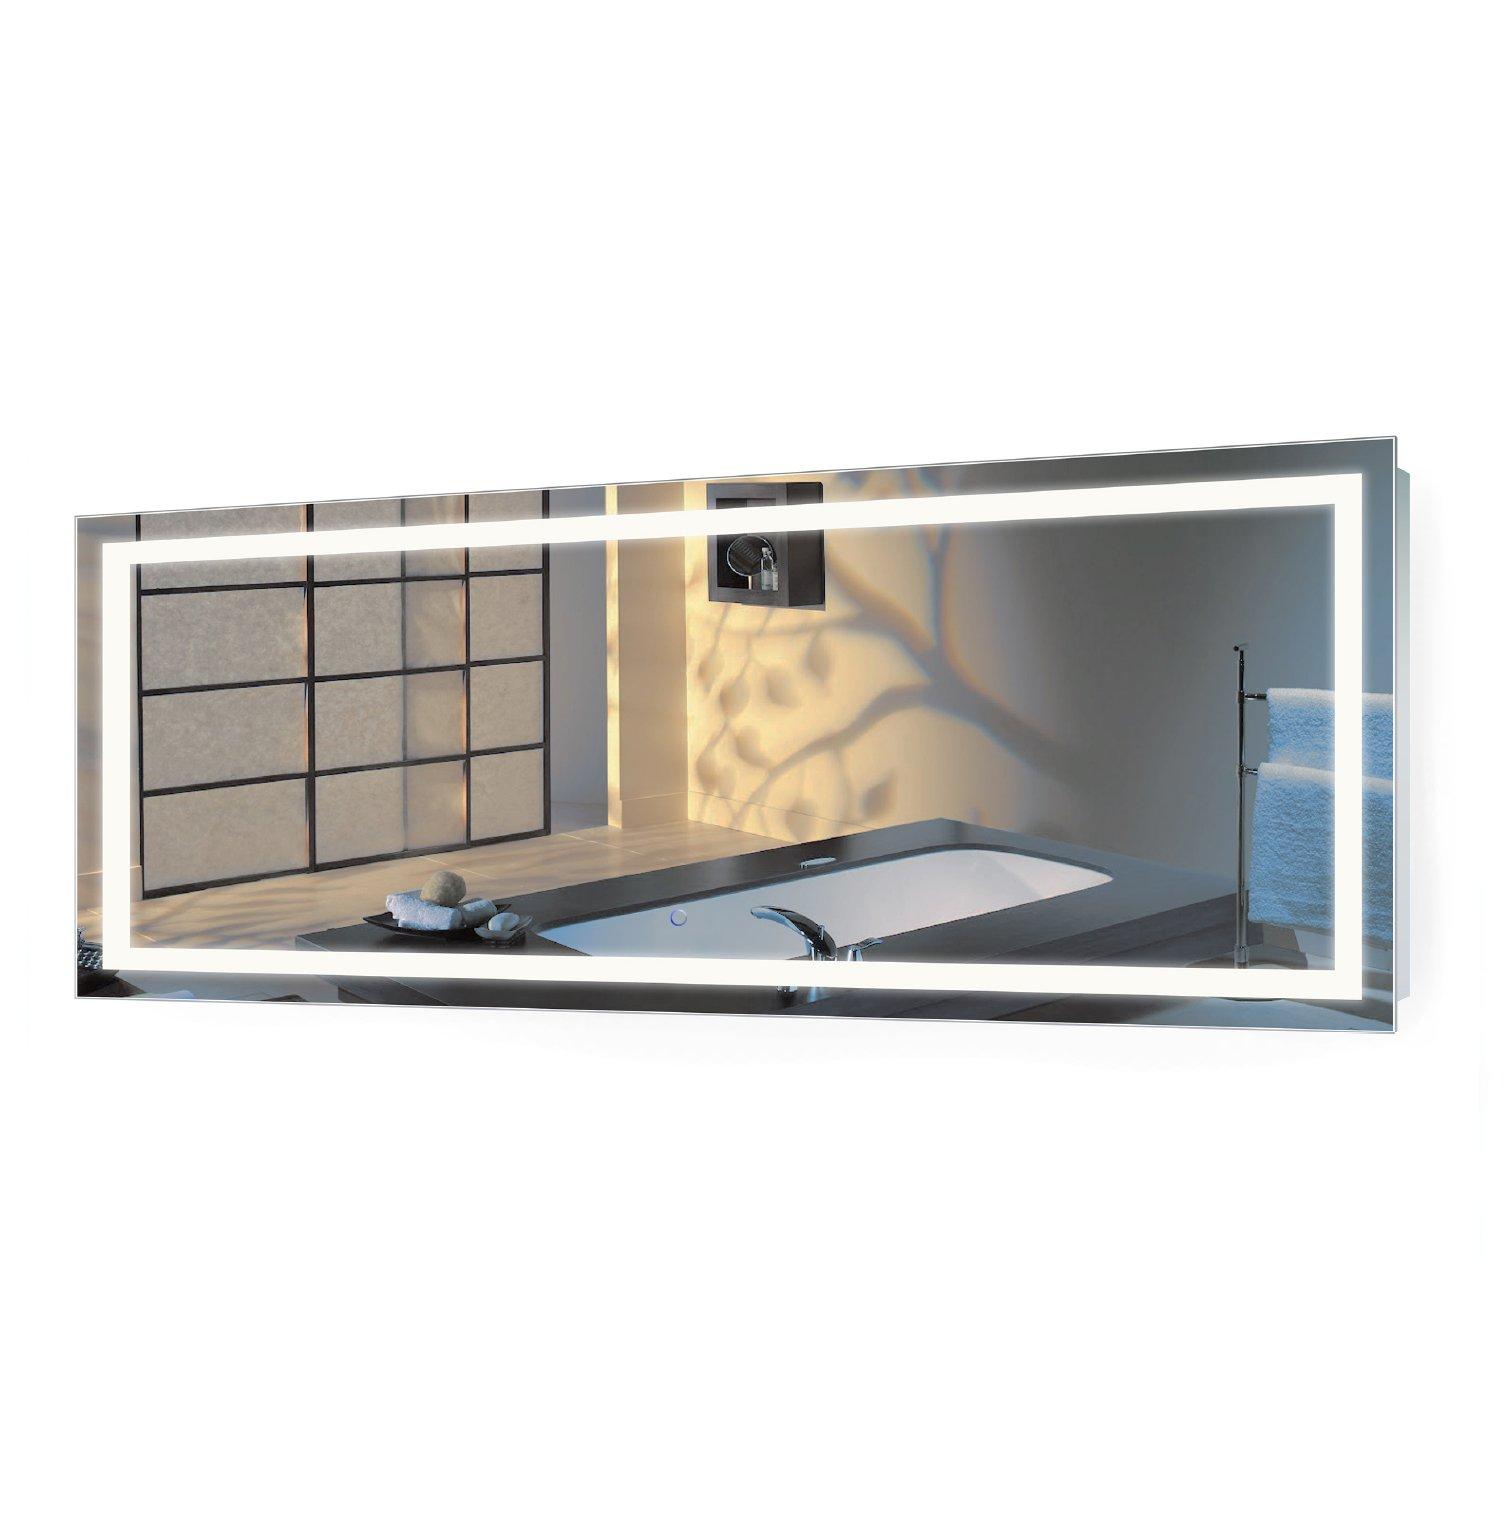 Large 72 inch x 30 inch led bathroom mirror lighted - Large horizontal bathroom mirrors ...